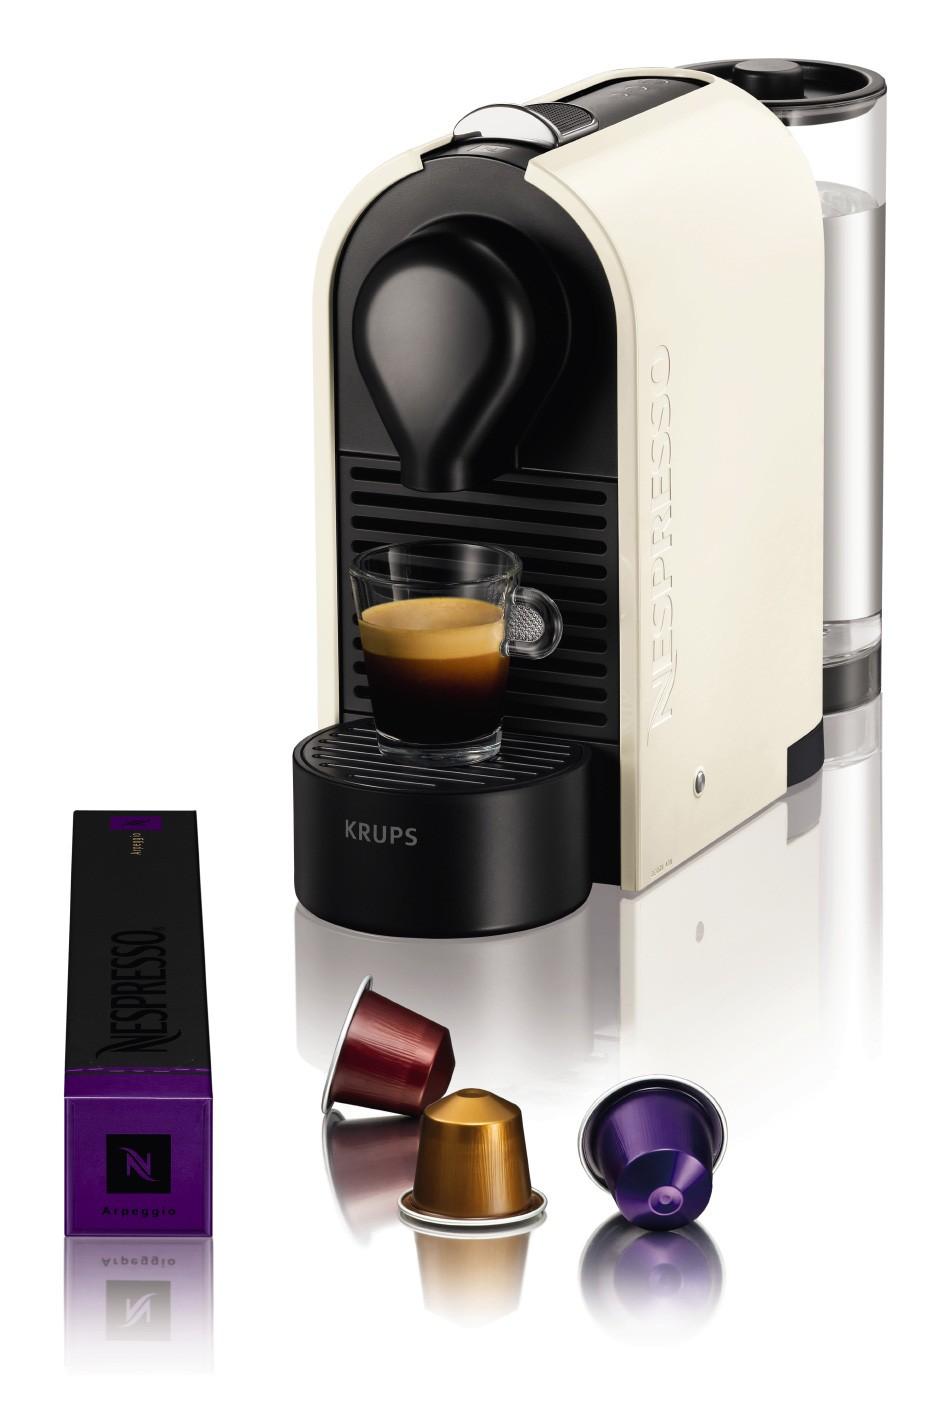 cafetiere nespresso a dosettes krups u pure white yy1301fd